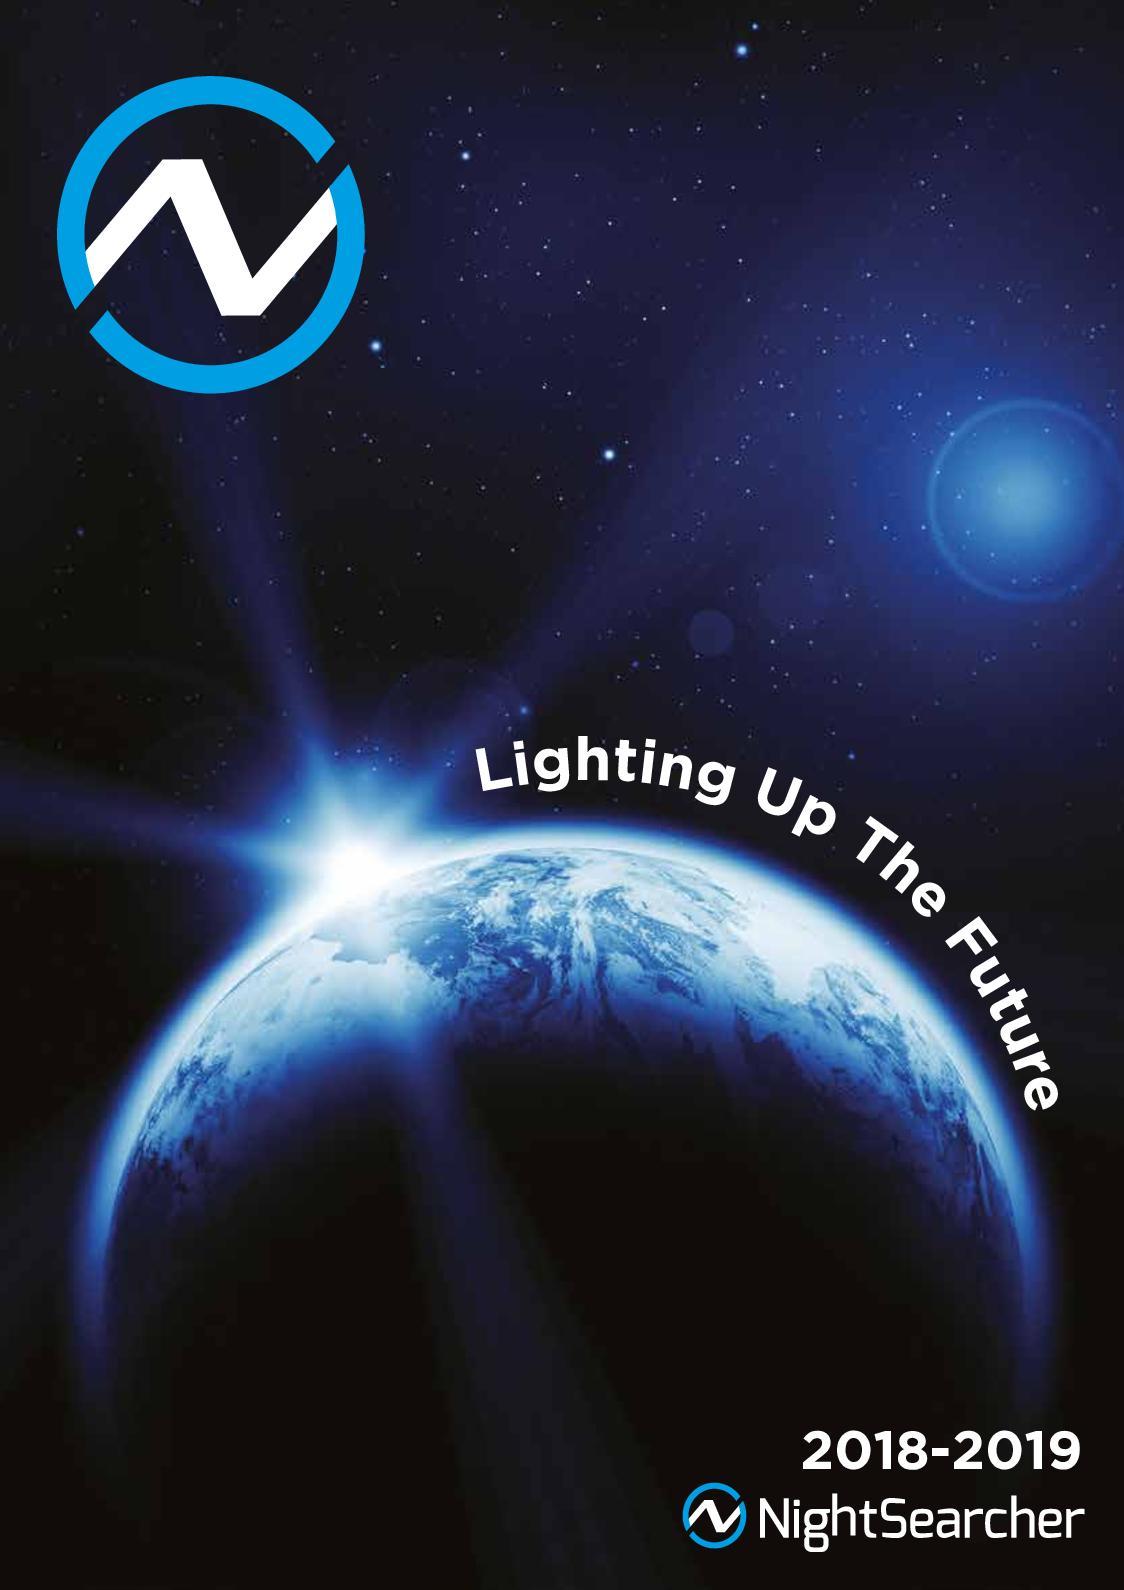 Nightsearcher UV395 LED Torch